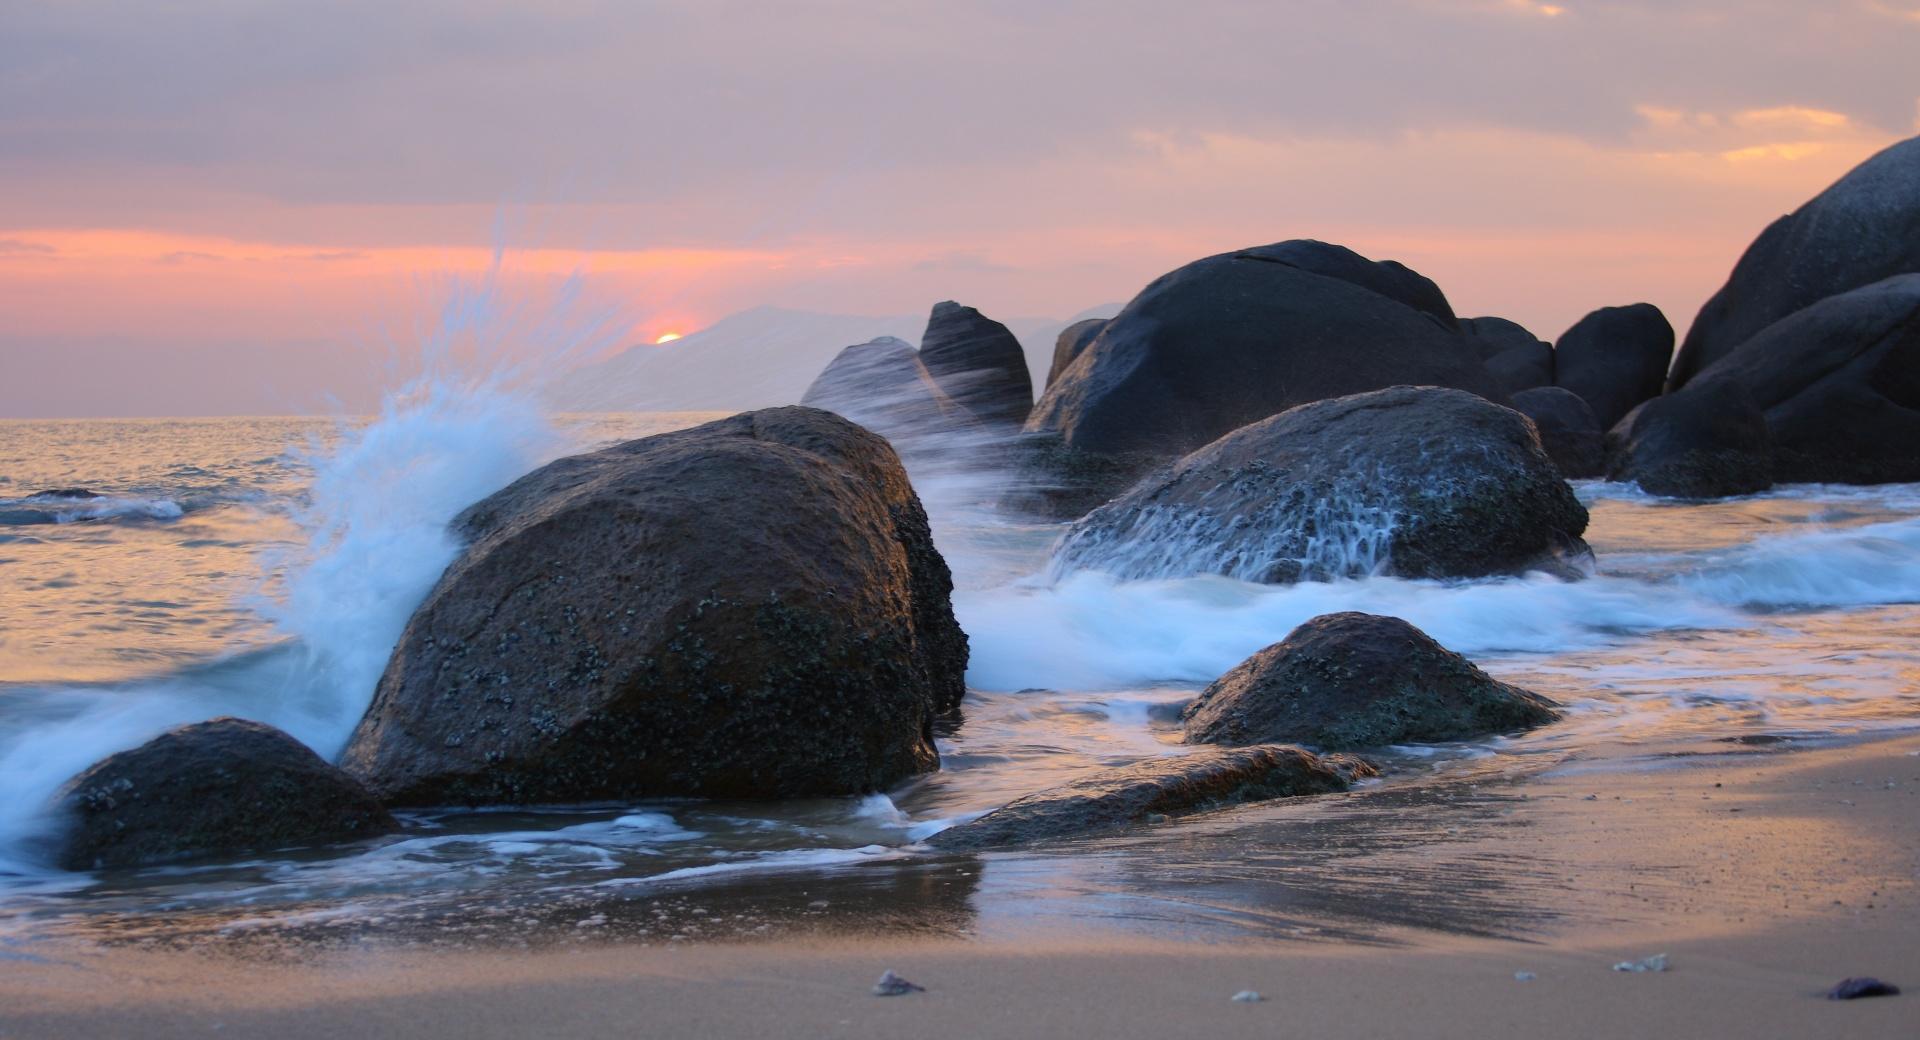 Sea Shore Rocks wallpapers HD quality